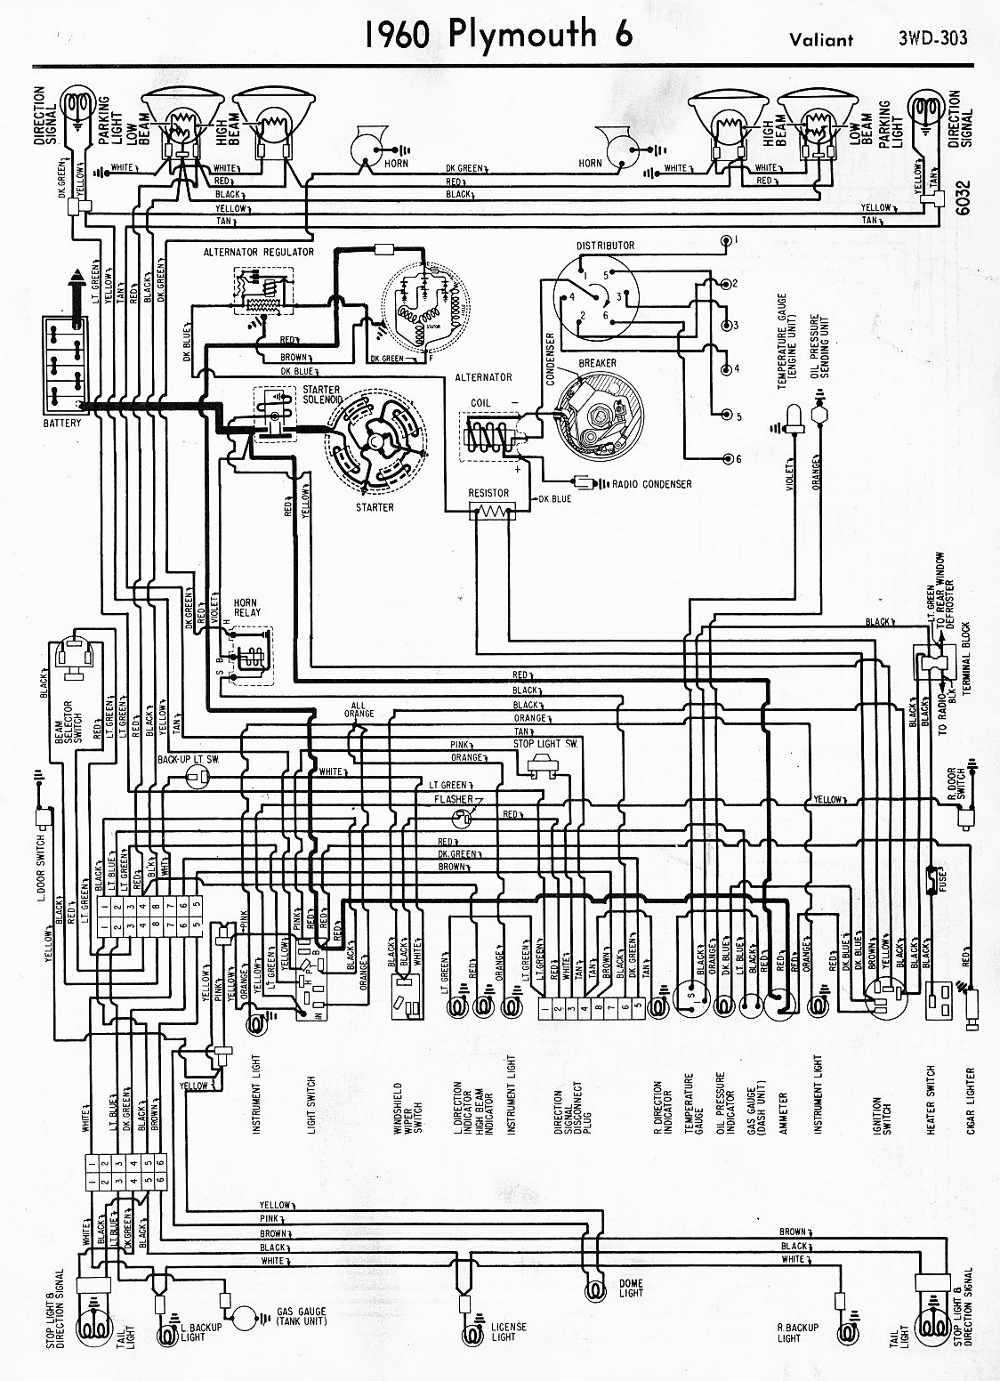 chrysler valiant wiring diagram simple wiring diagram dodge dakota wiring diagrams 1966 plymouth valiant wiring diagram [ 1000 x 1381 Pixel ]